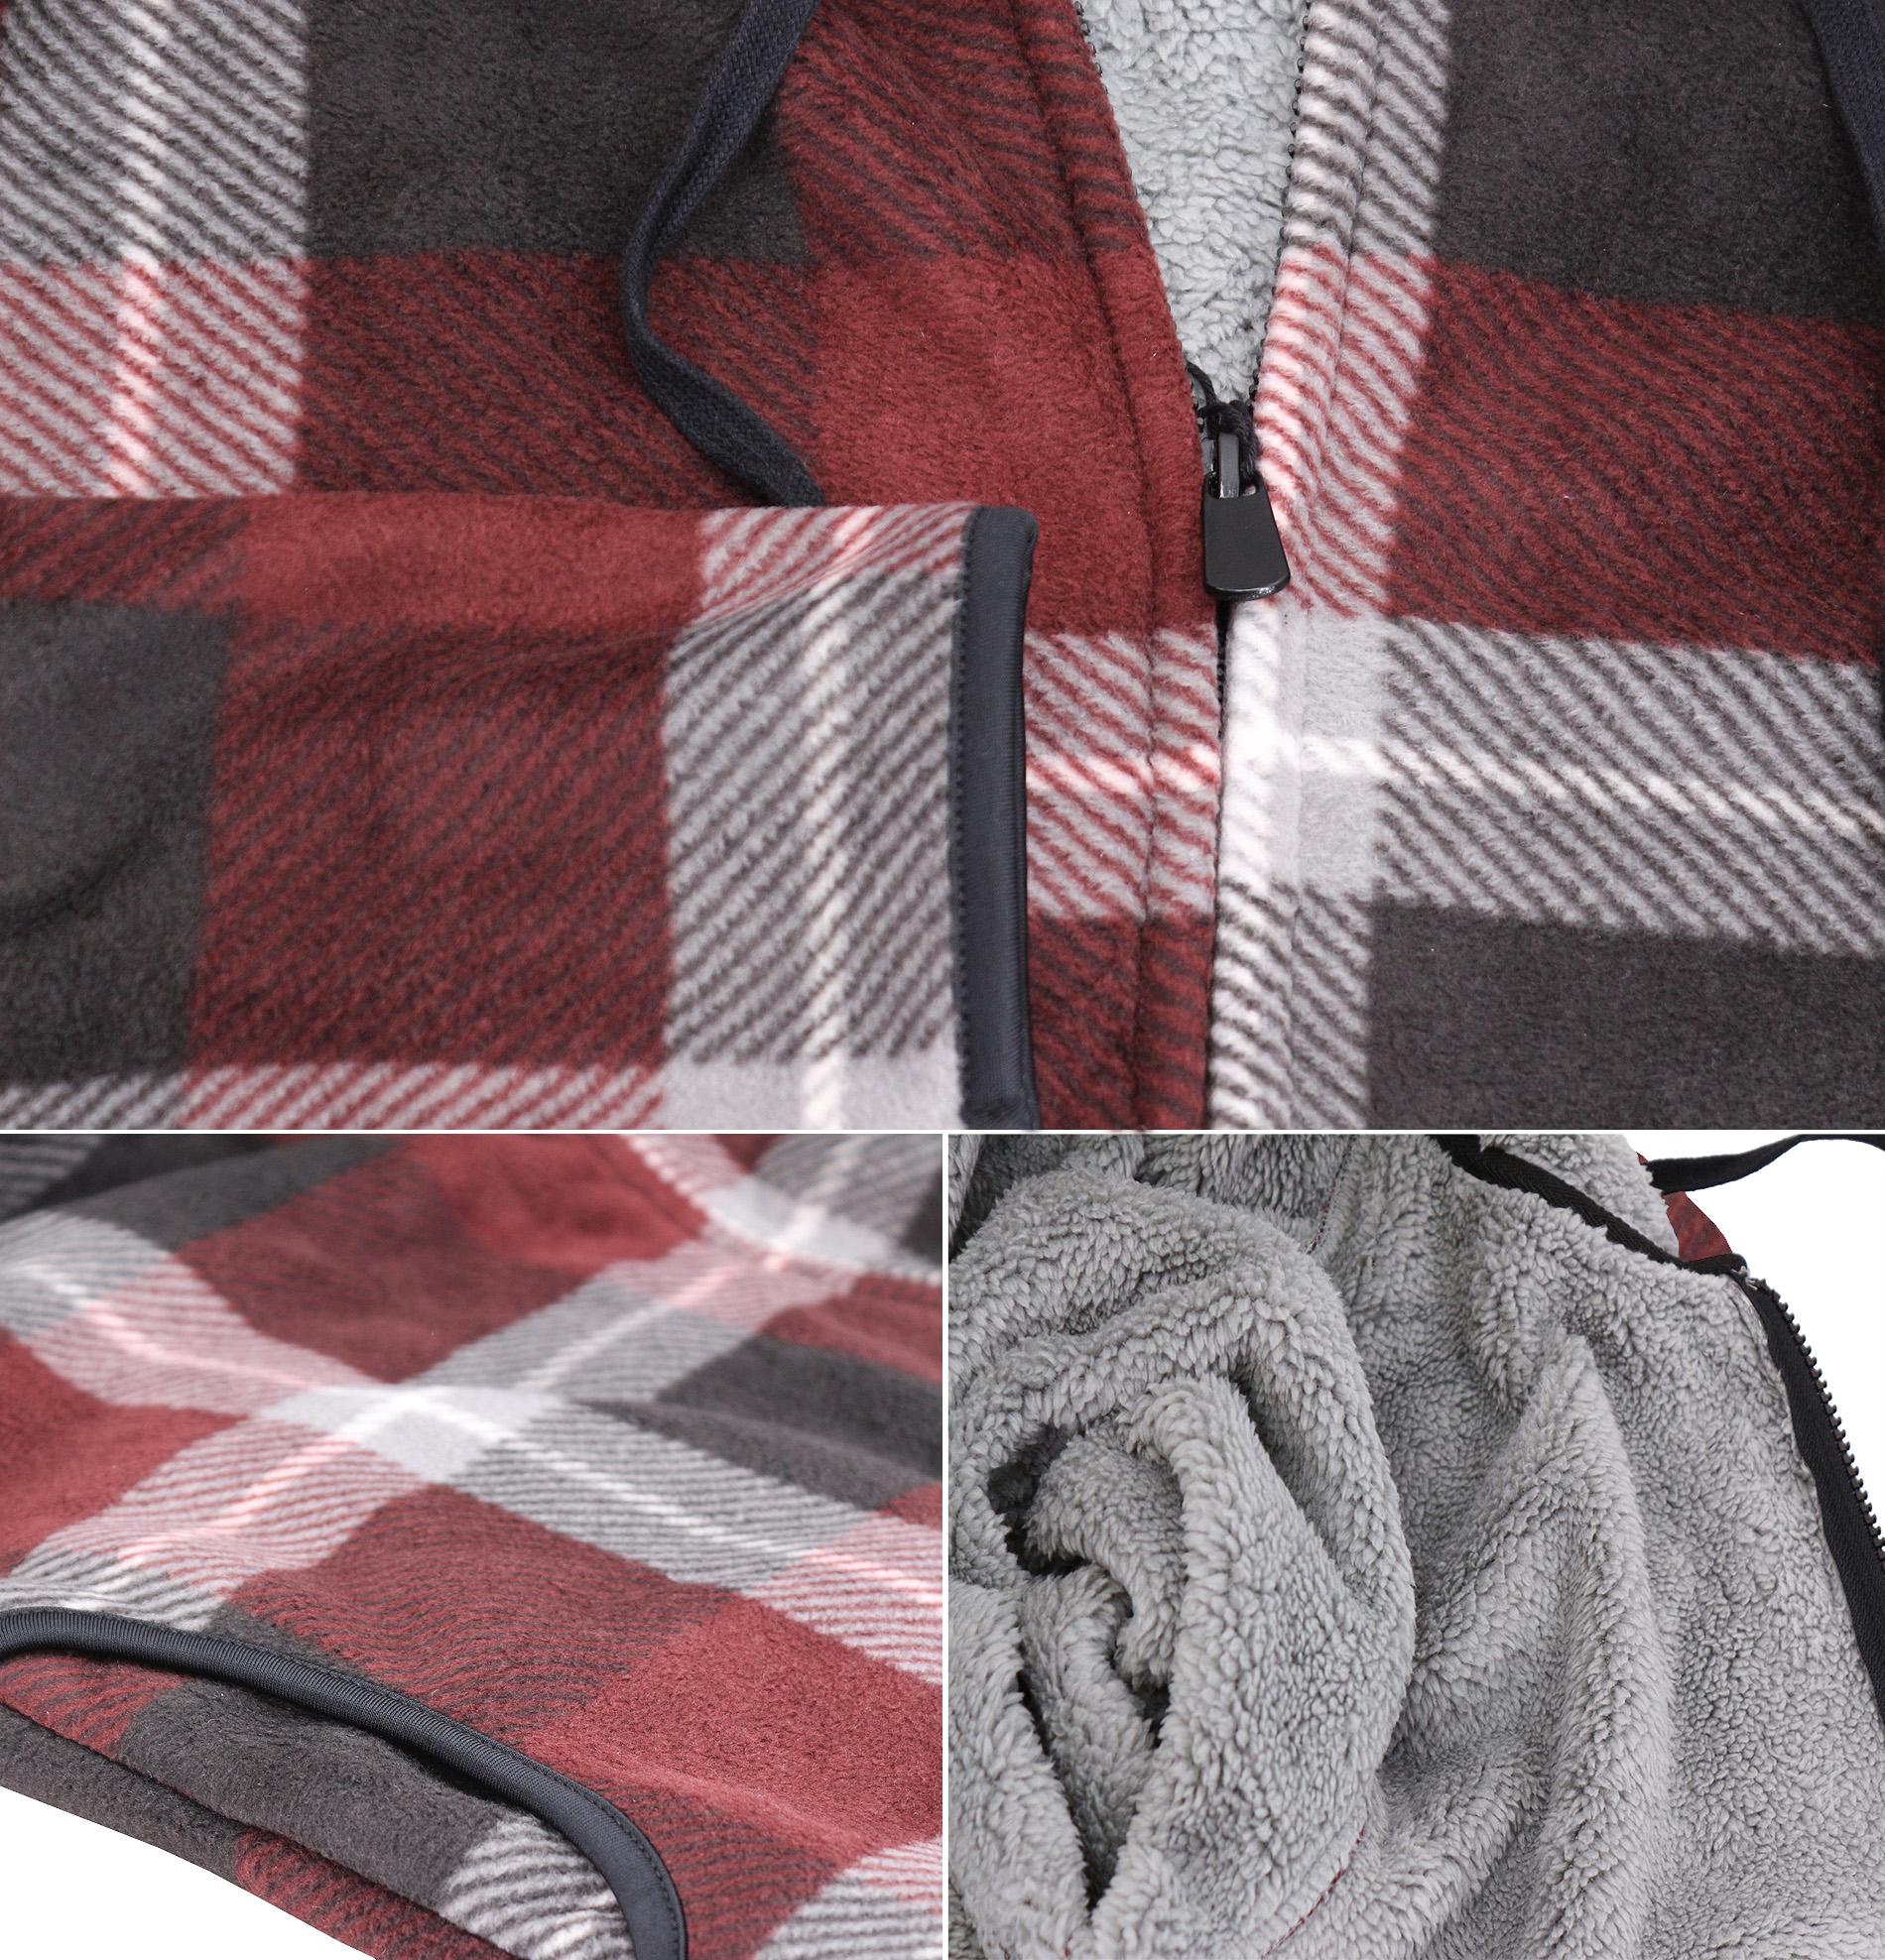 thumbnail 4 - Men-039-s-Casual-Flannel-Zip-Up-Fleece-Lined-Plaid-Sherpa-Hoodie-Lightweight-Jacket